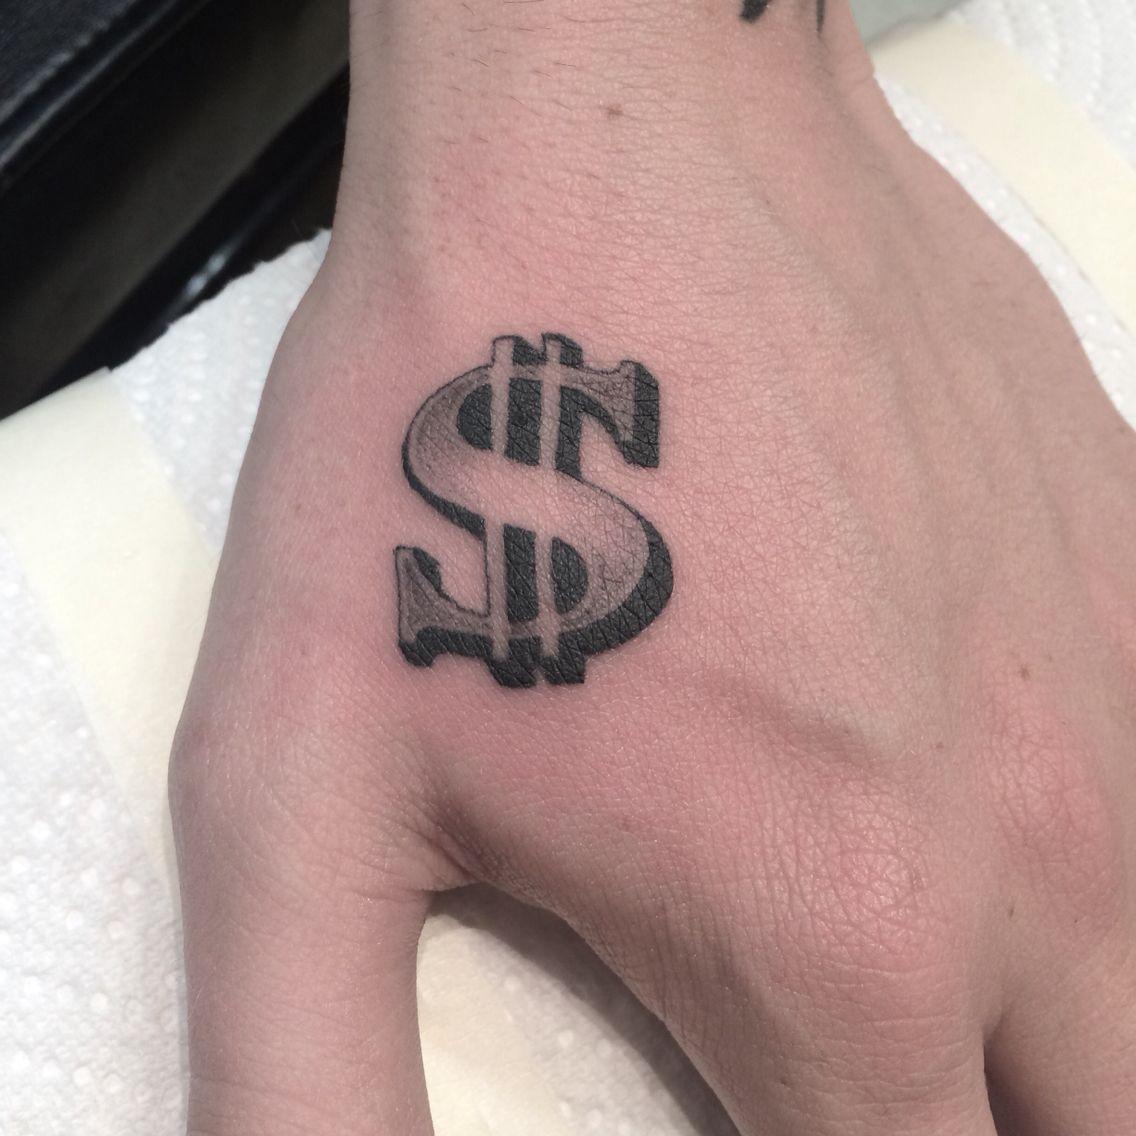 Royal Peacock Tattoo Parlor Hand Tattoos For Guys Money Tattoo Money Sign Tattoo